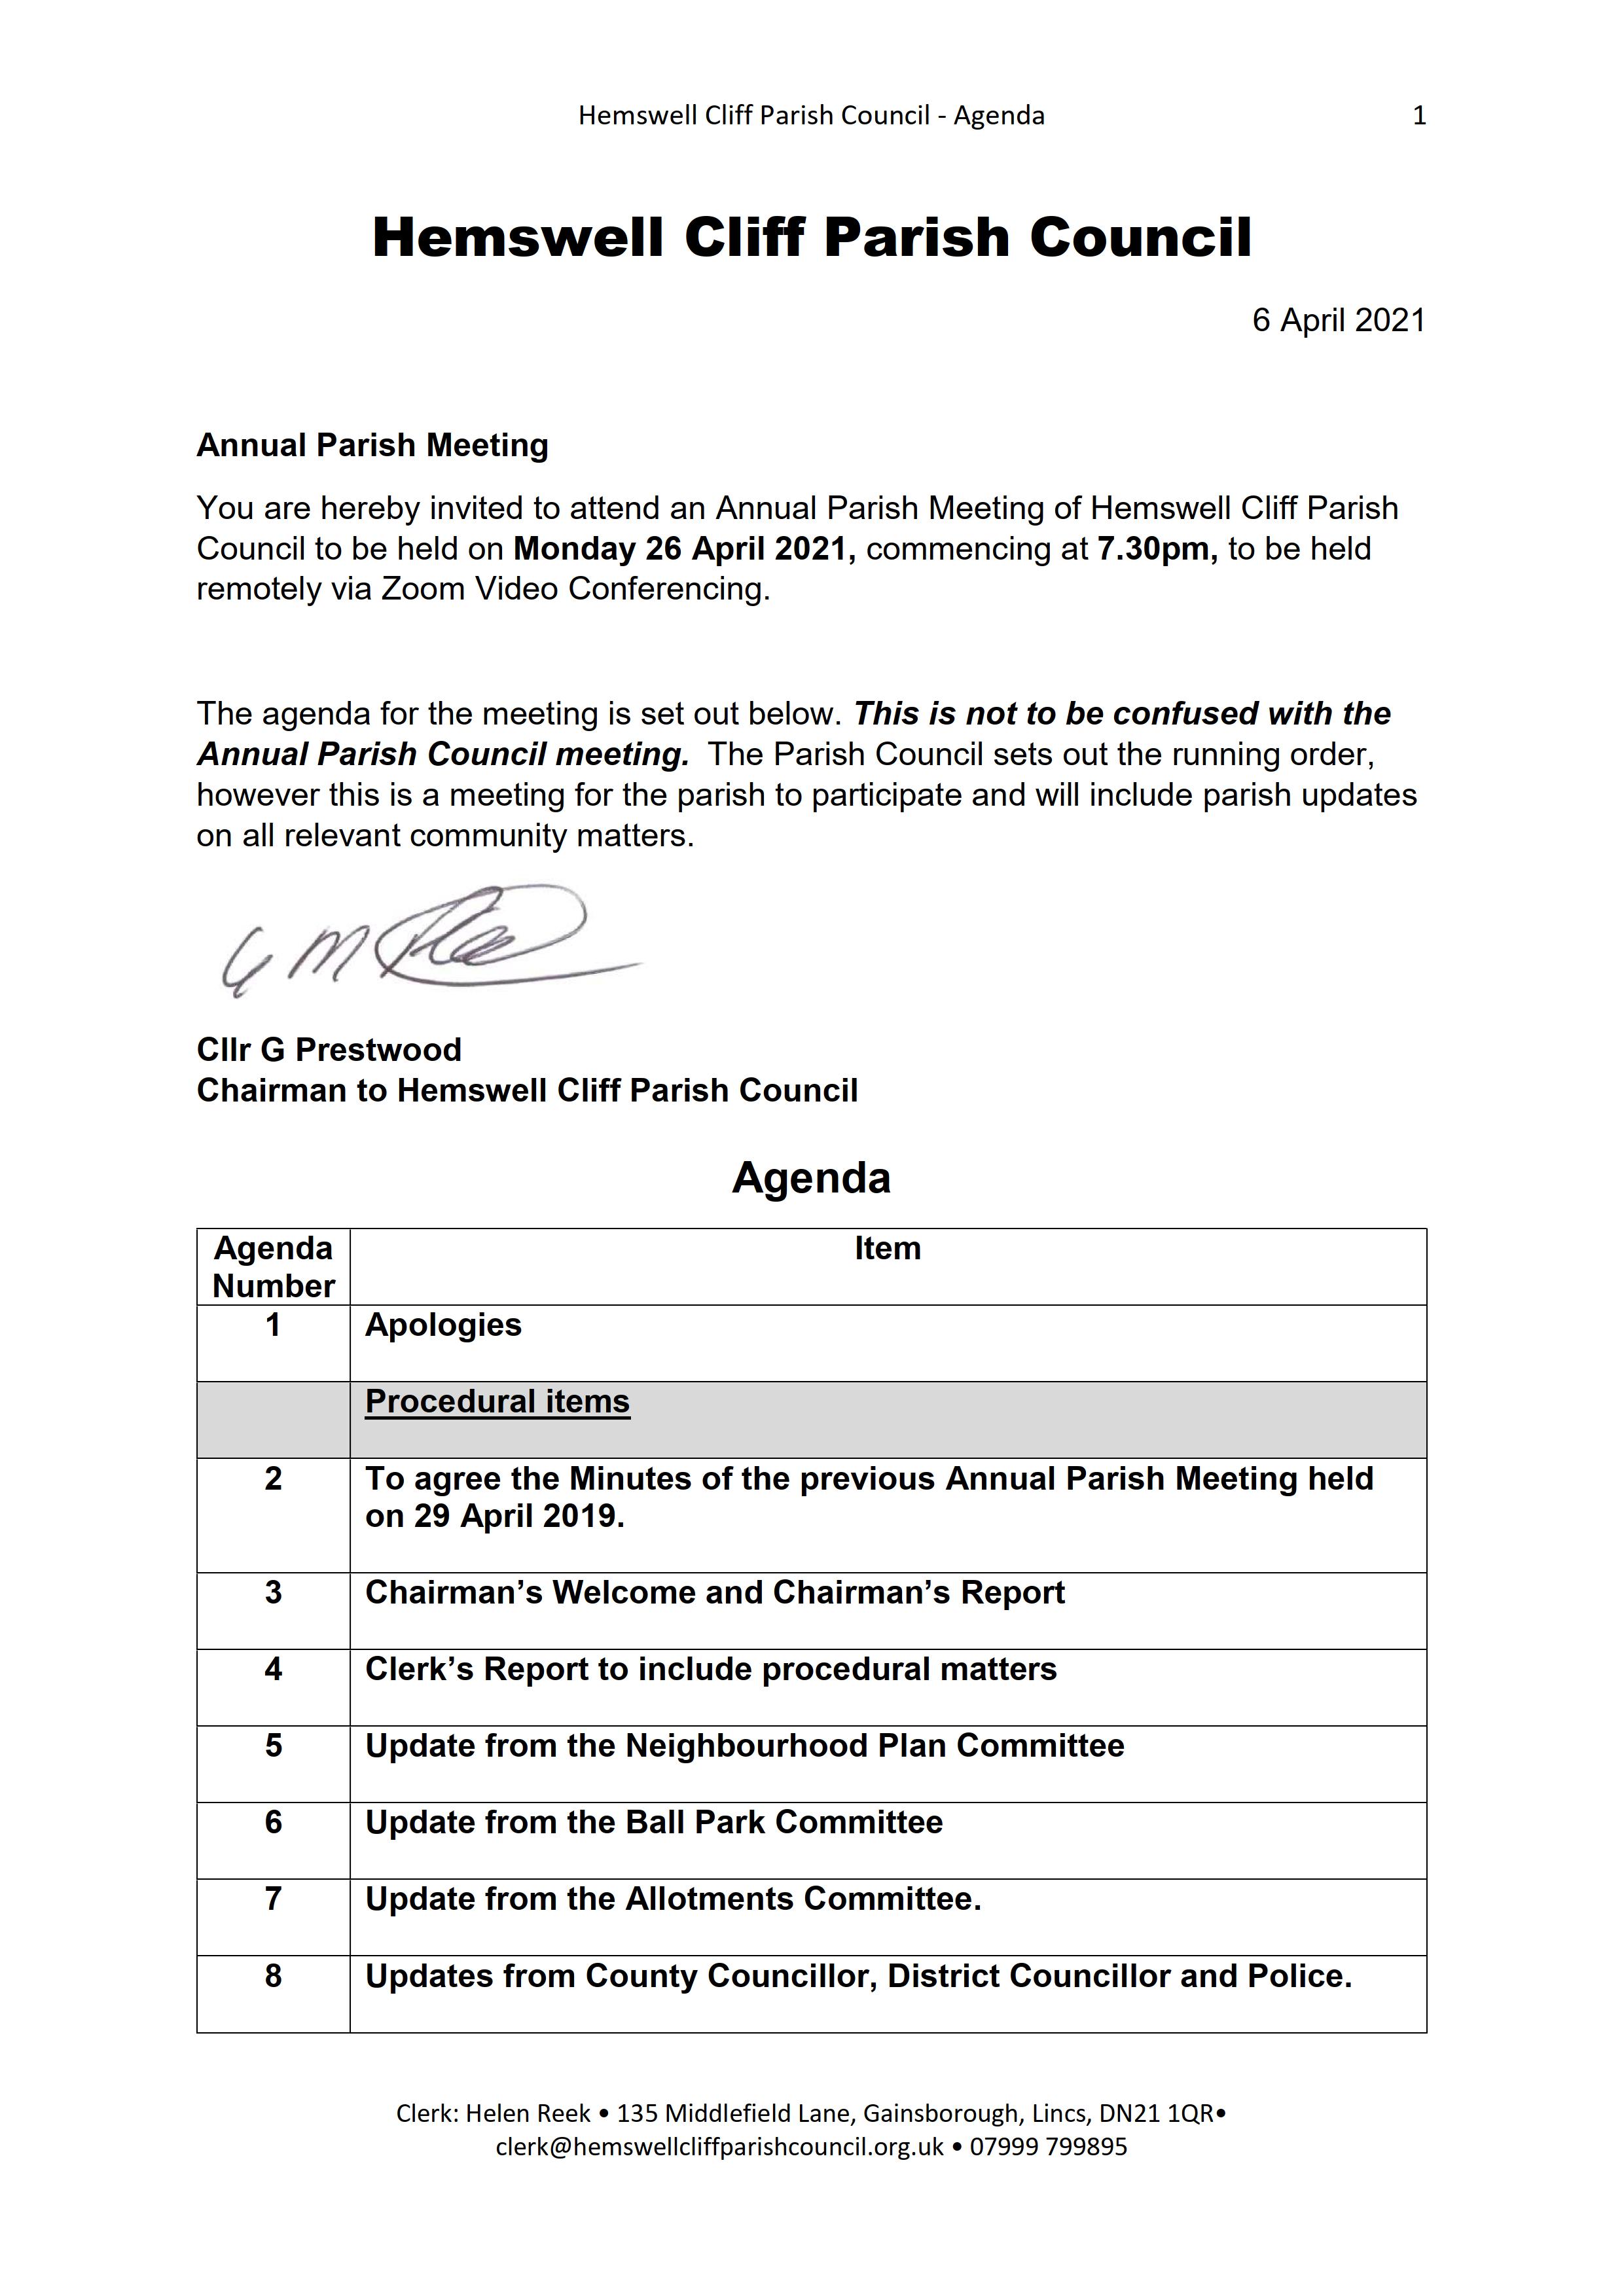 HCPCAPM_Agenda_26.04.21_1.png